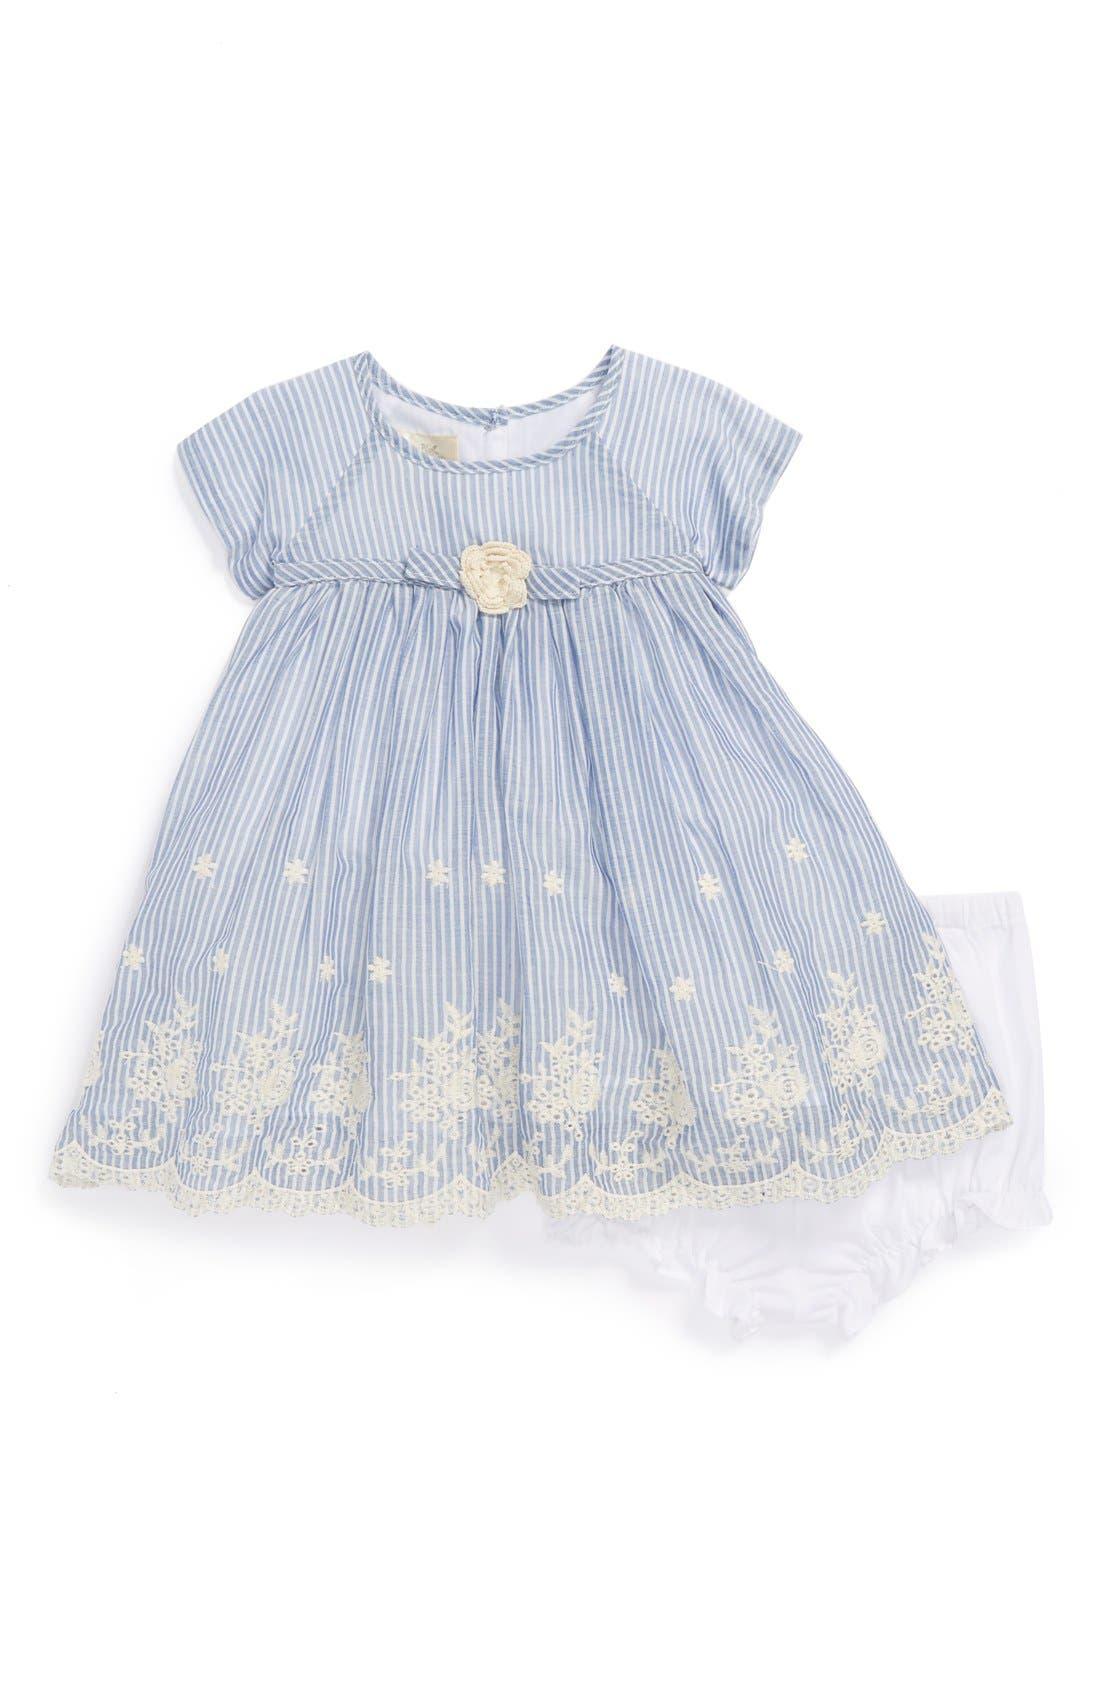 Alternate Image 1 Selected - Pippa & Julie Chambray & Eyelet Dress & Bloomers (Baby Girls)